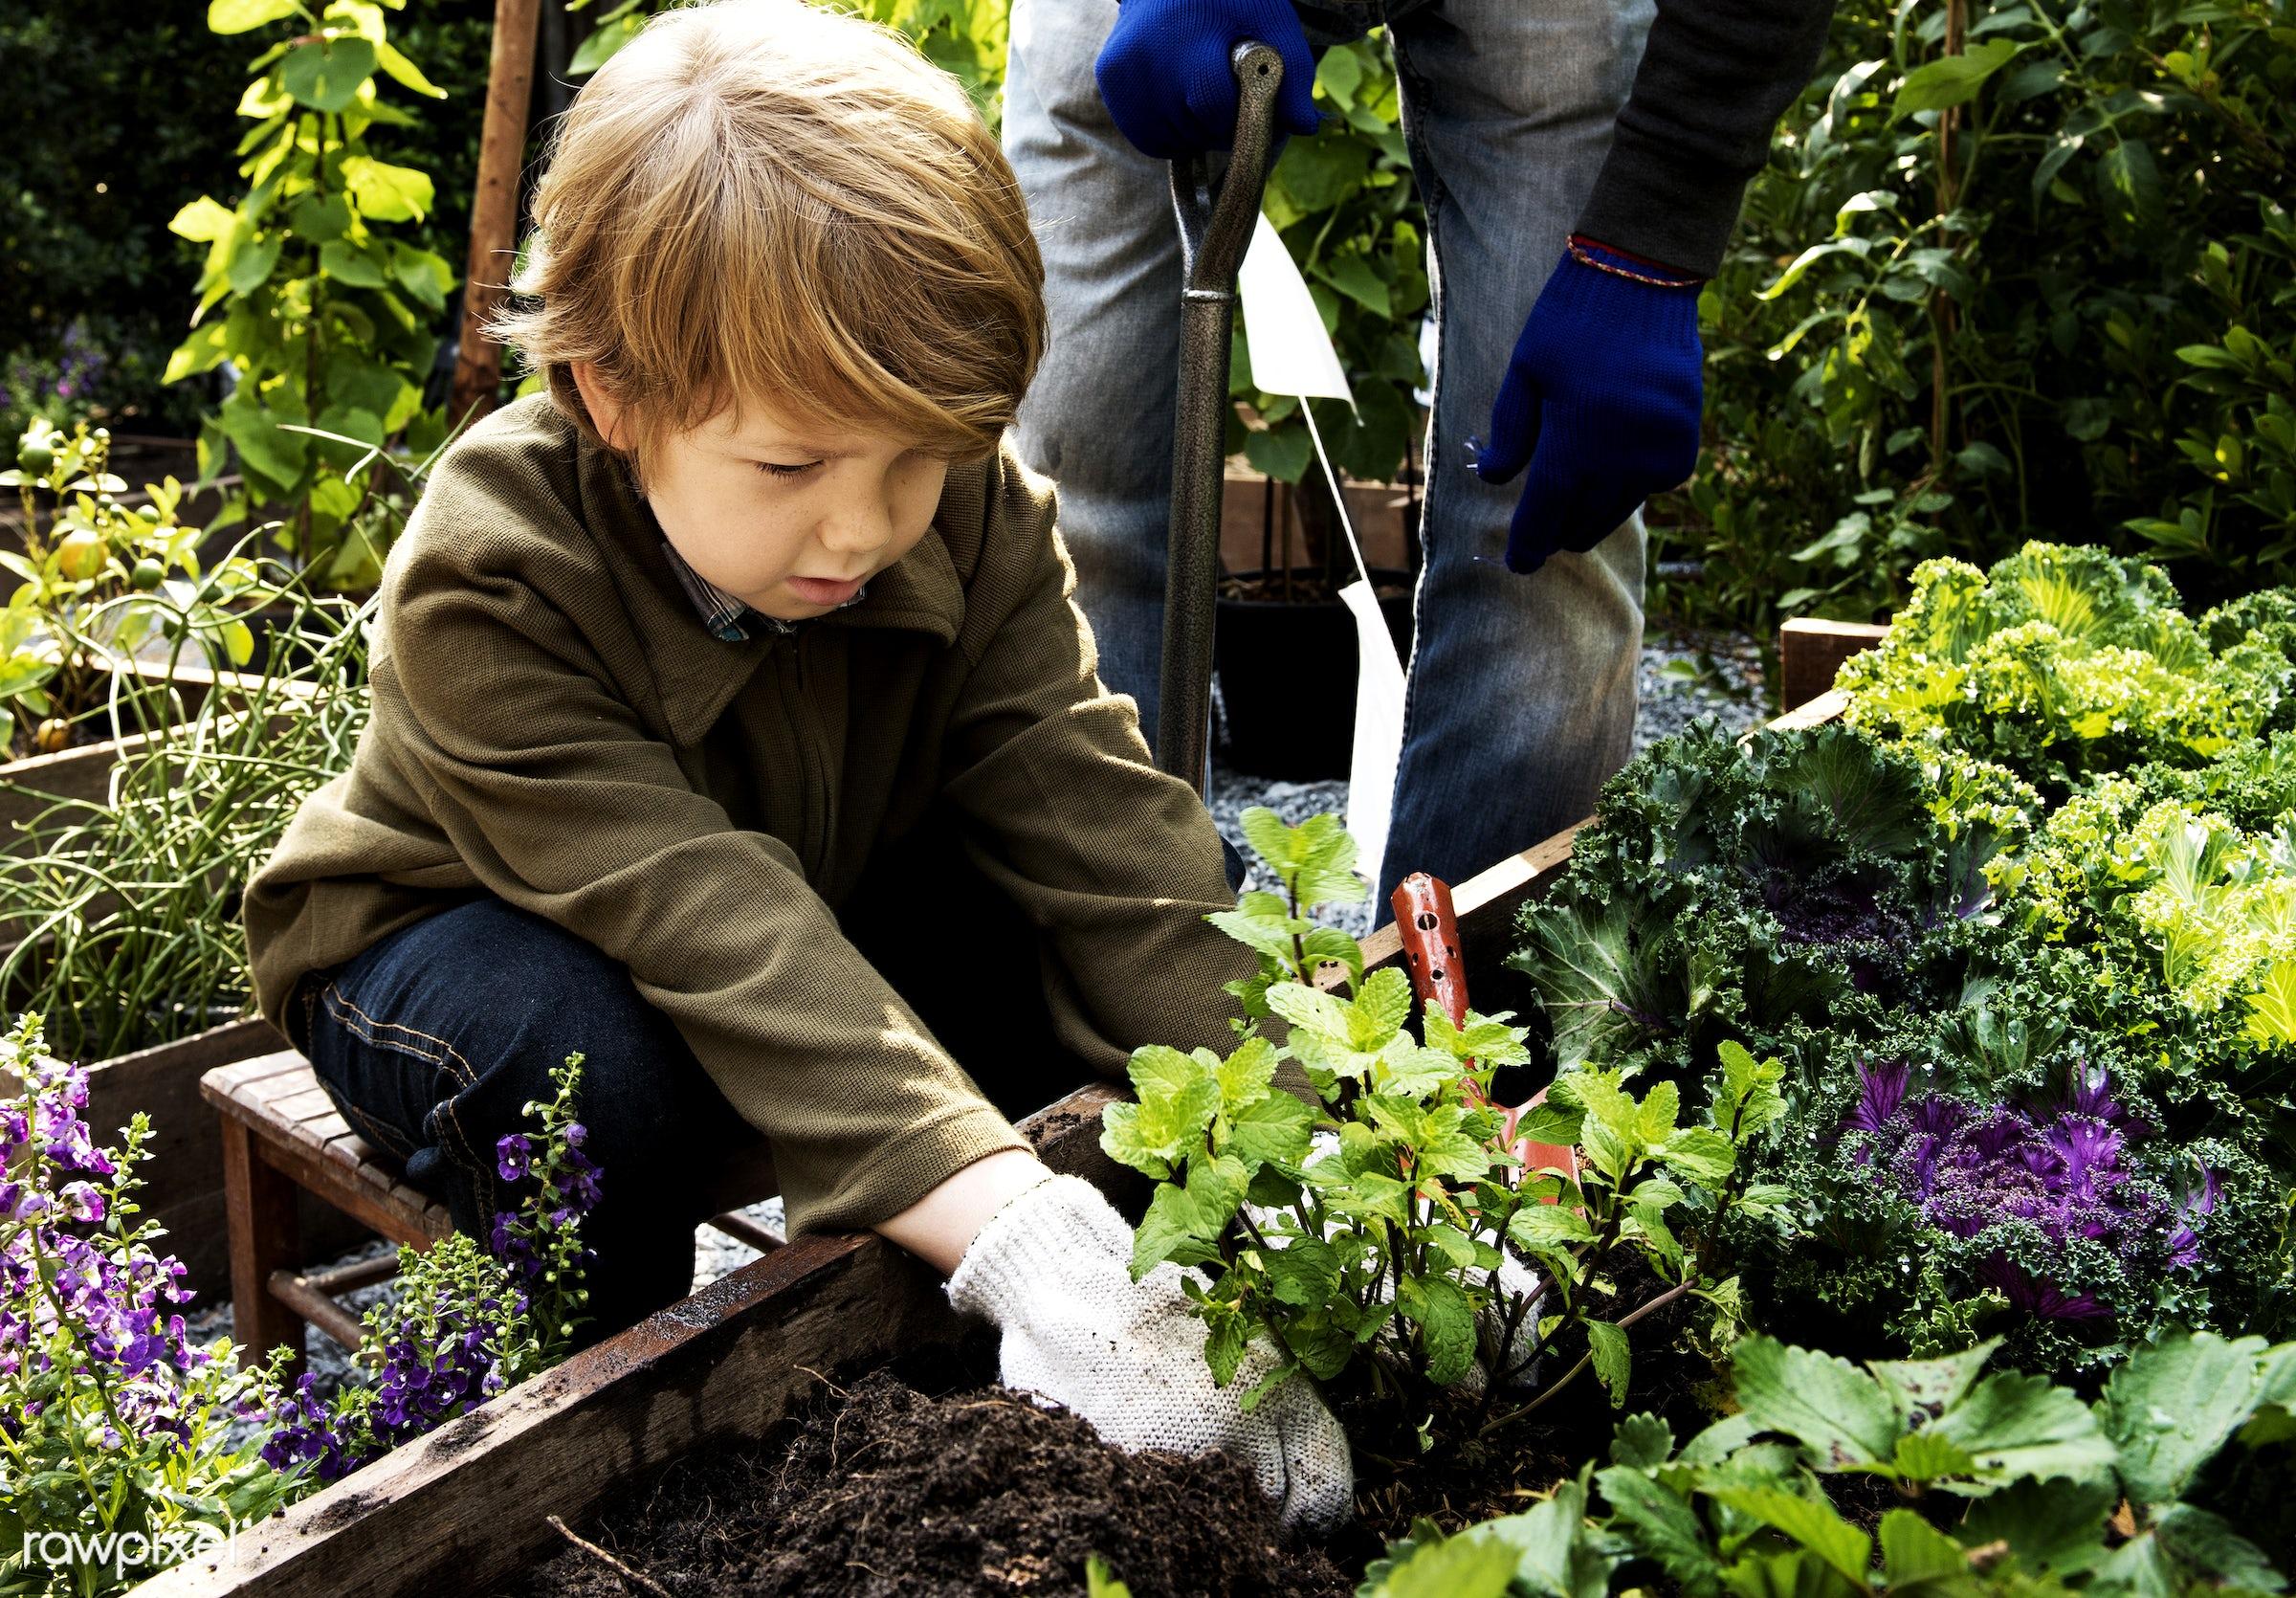 countryside, diverse, greenhouse, botanical, people, plantation, kid, teamwork, friends, tree, nature, lifestyle, friendship...